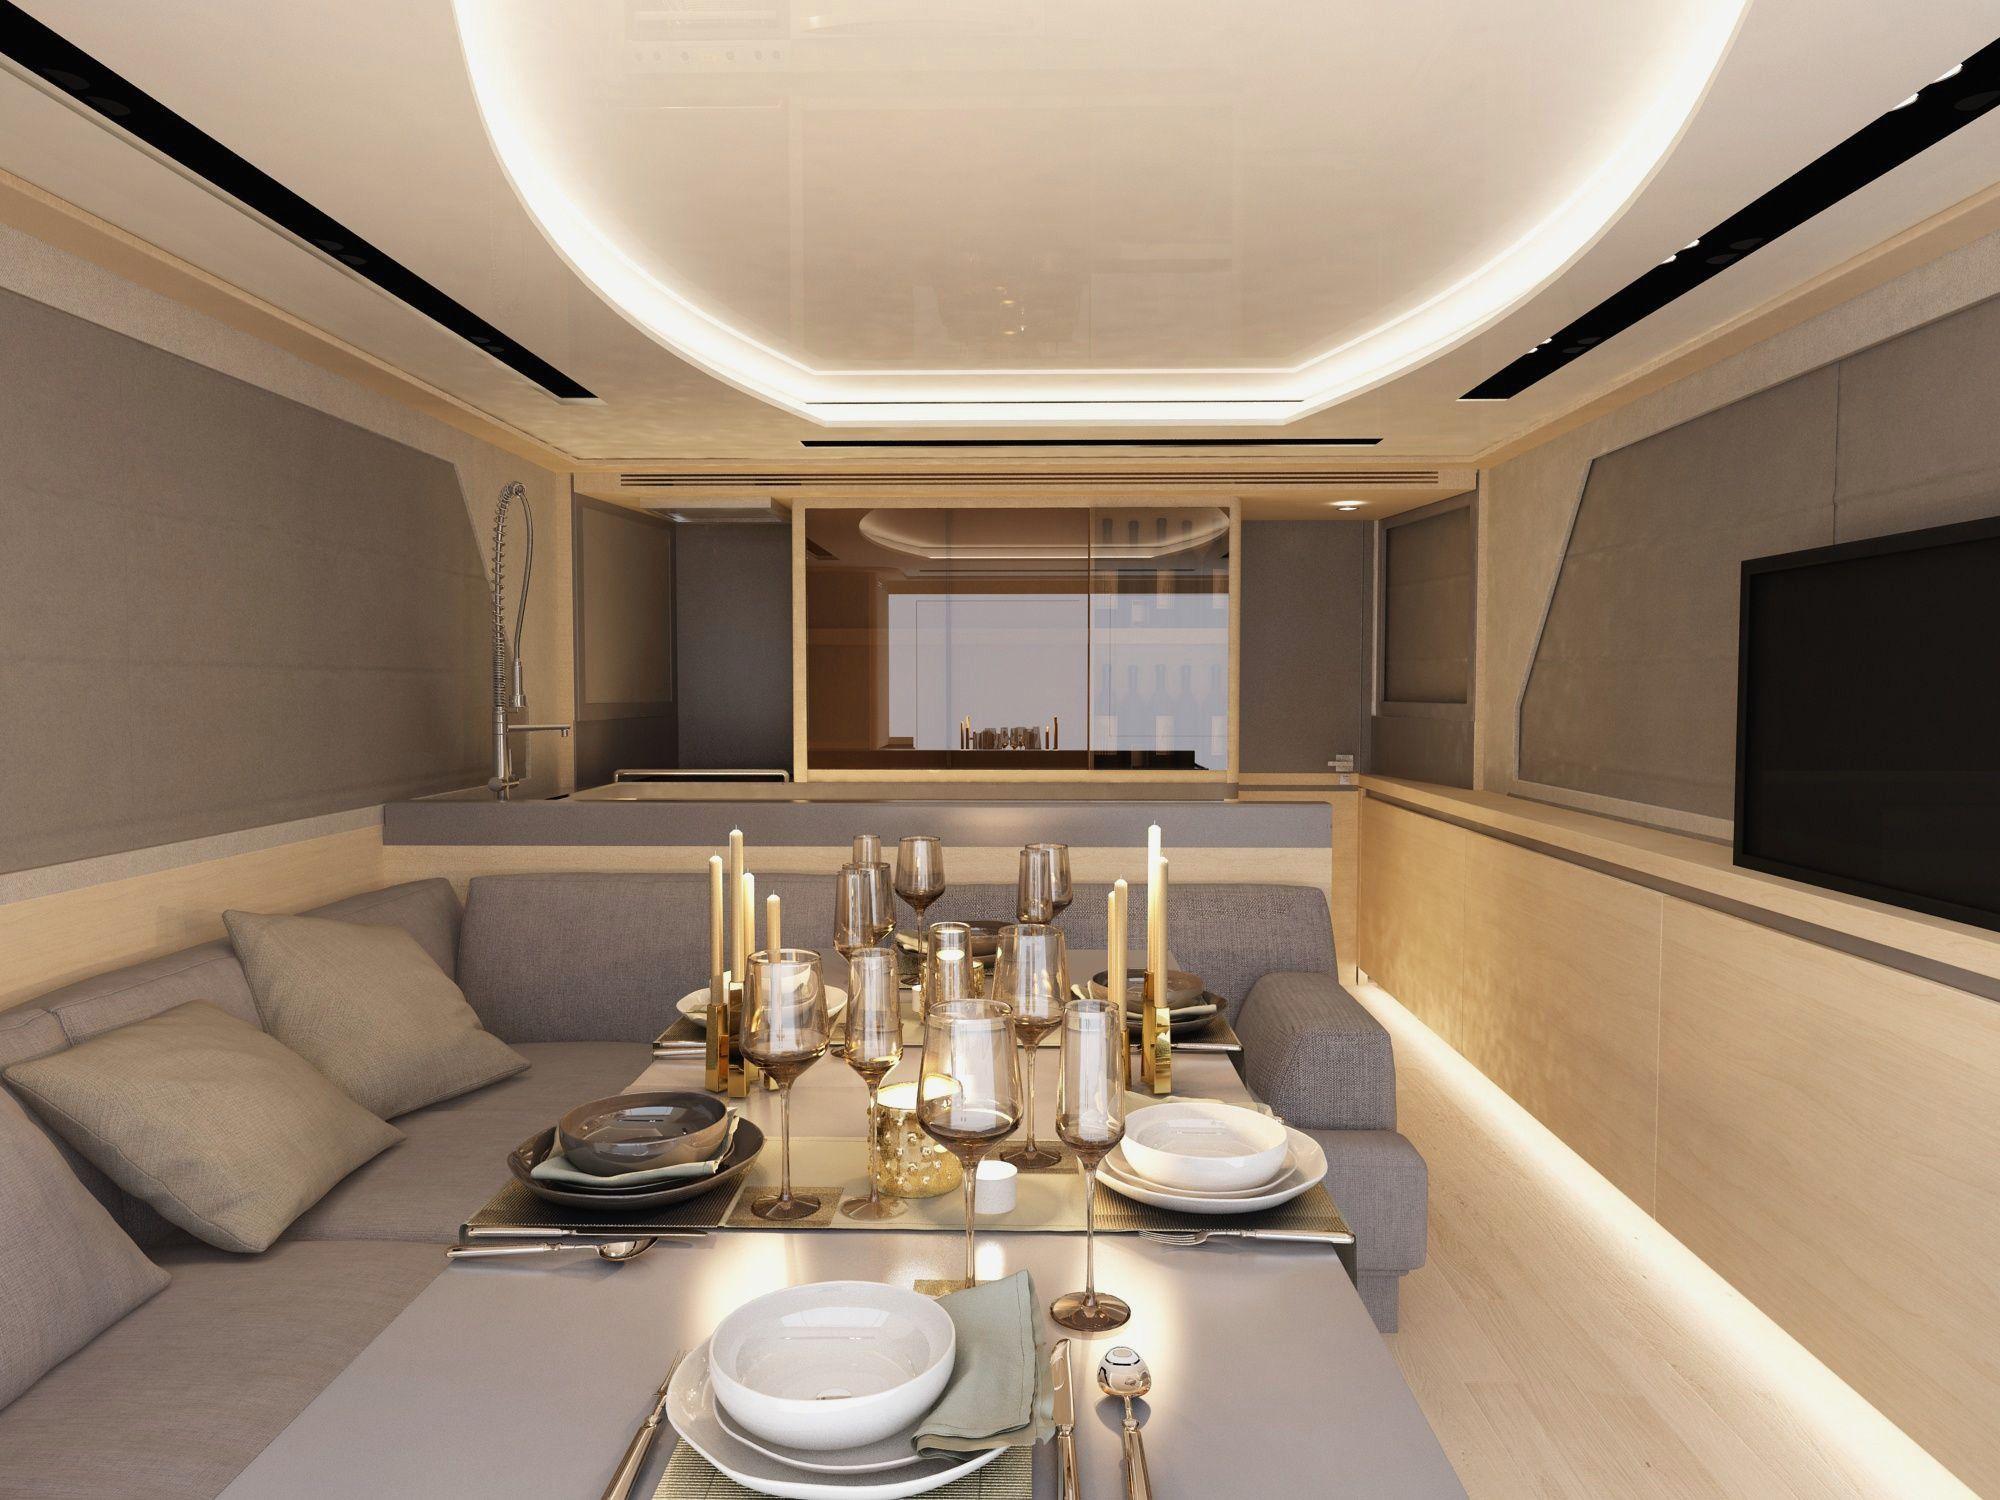 Interior design creative yacht interior design school home design wonderfull luxury at room design ideas